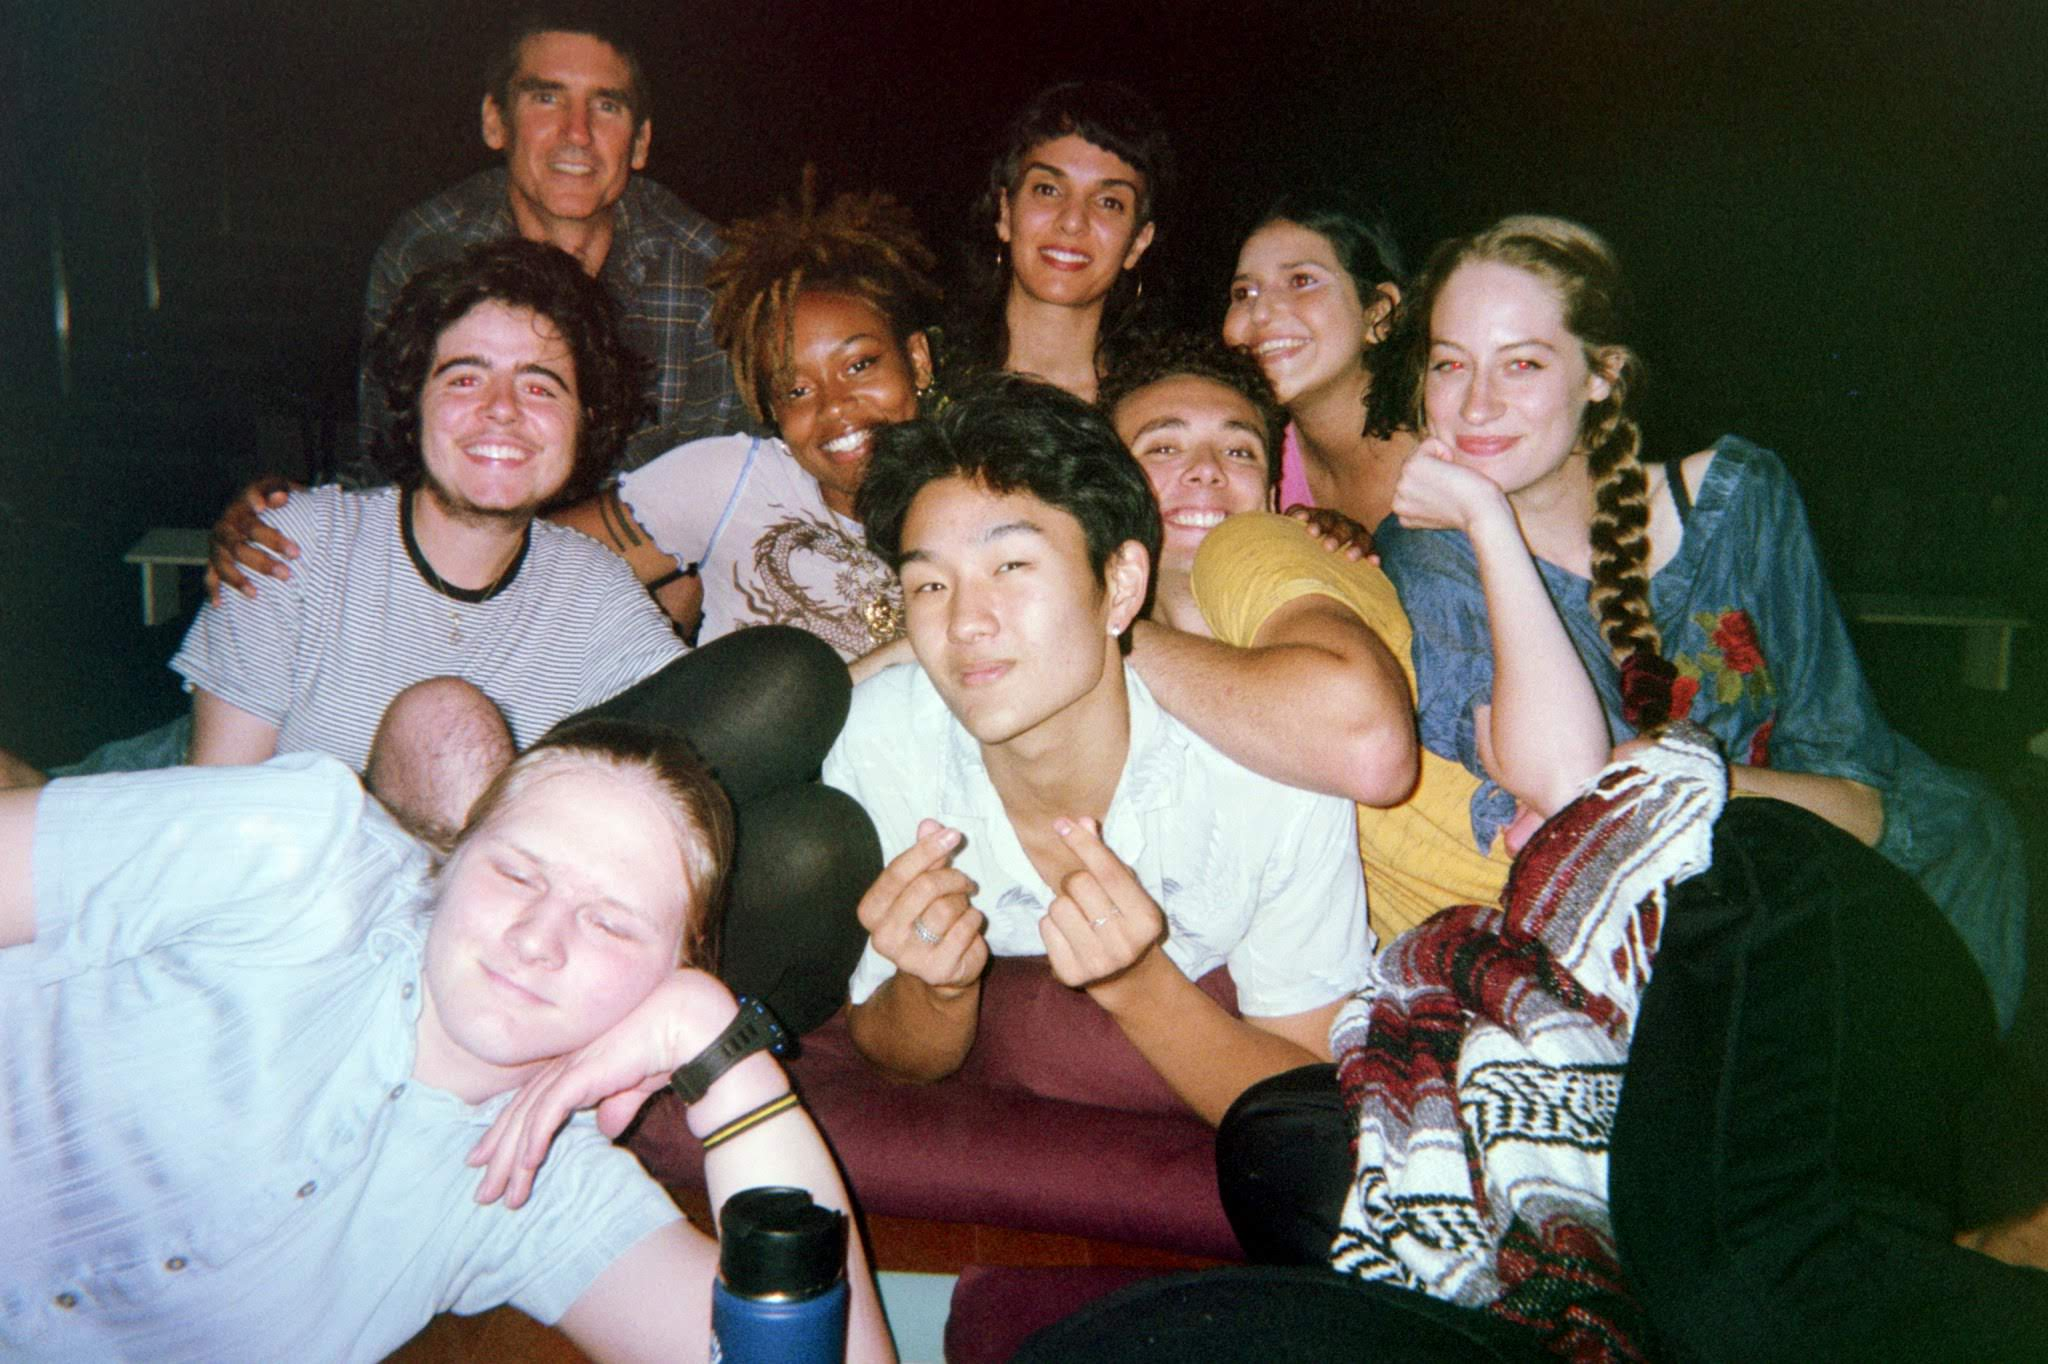 Summer Program - Group Discussions | Inward Bound Mindfulness Education: Massachusetts Teen Retreat